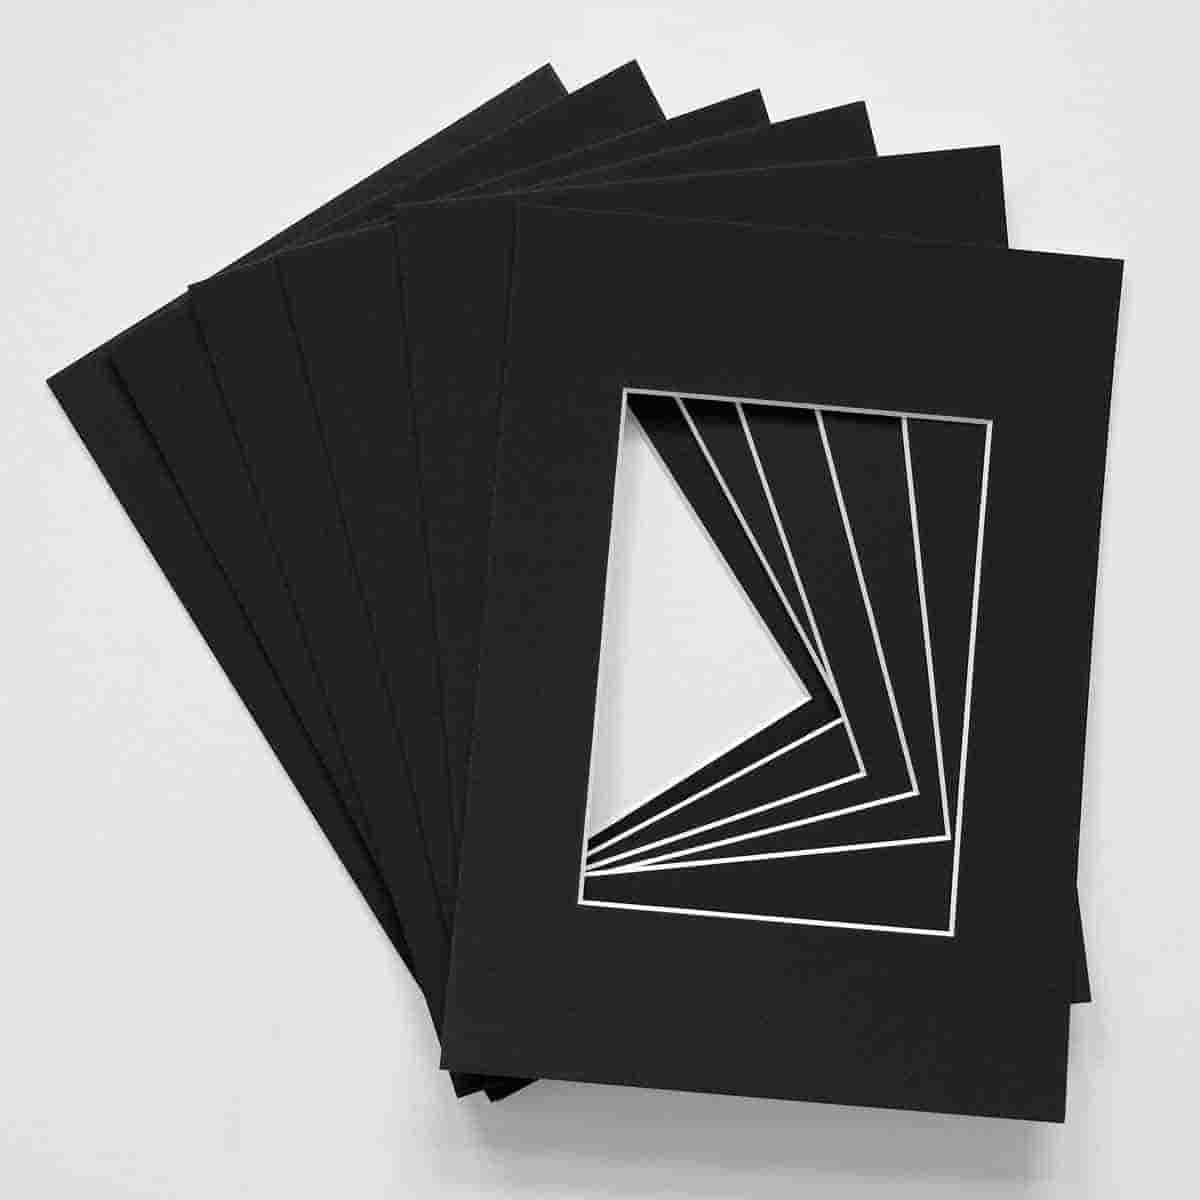 carutilas para fotos negras